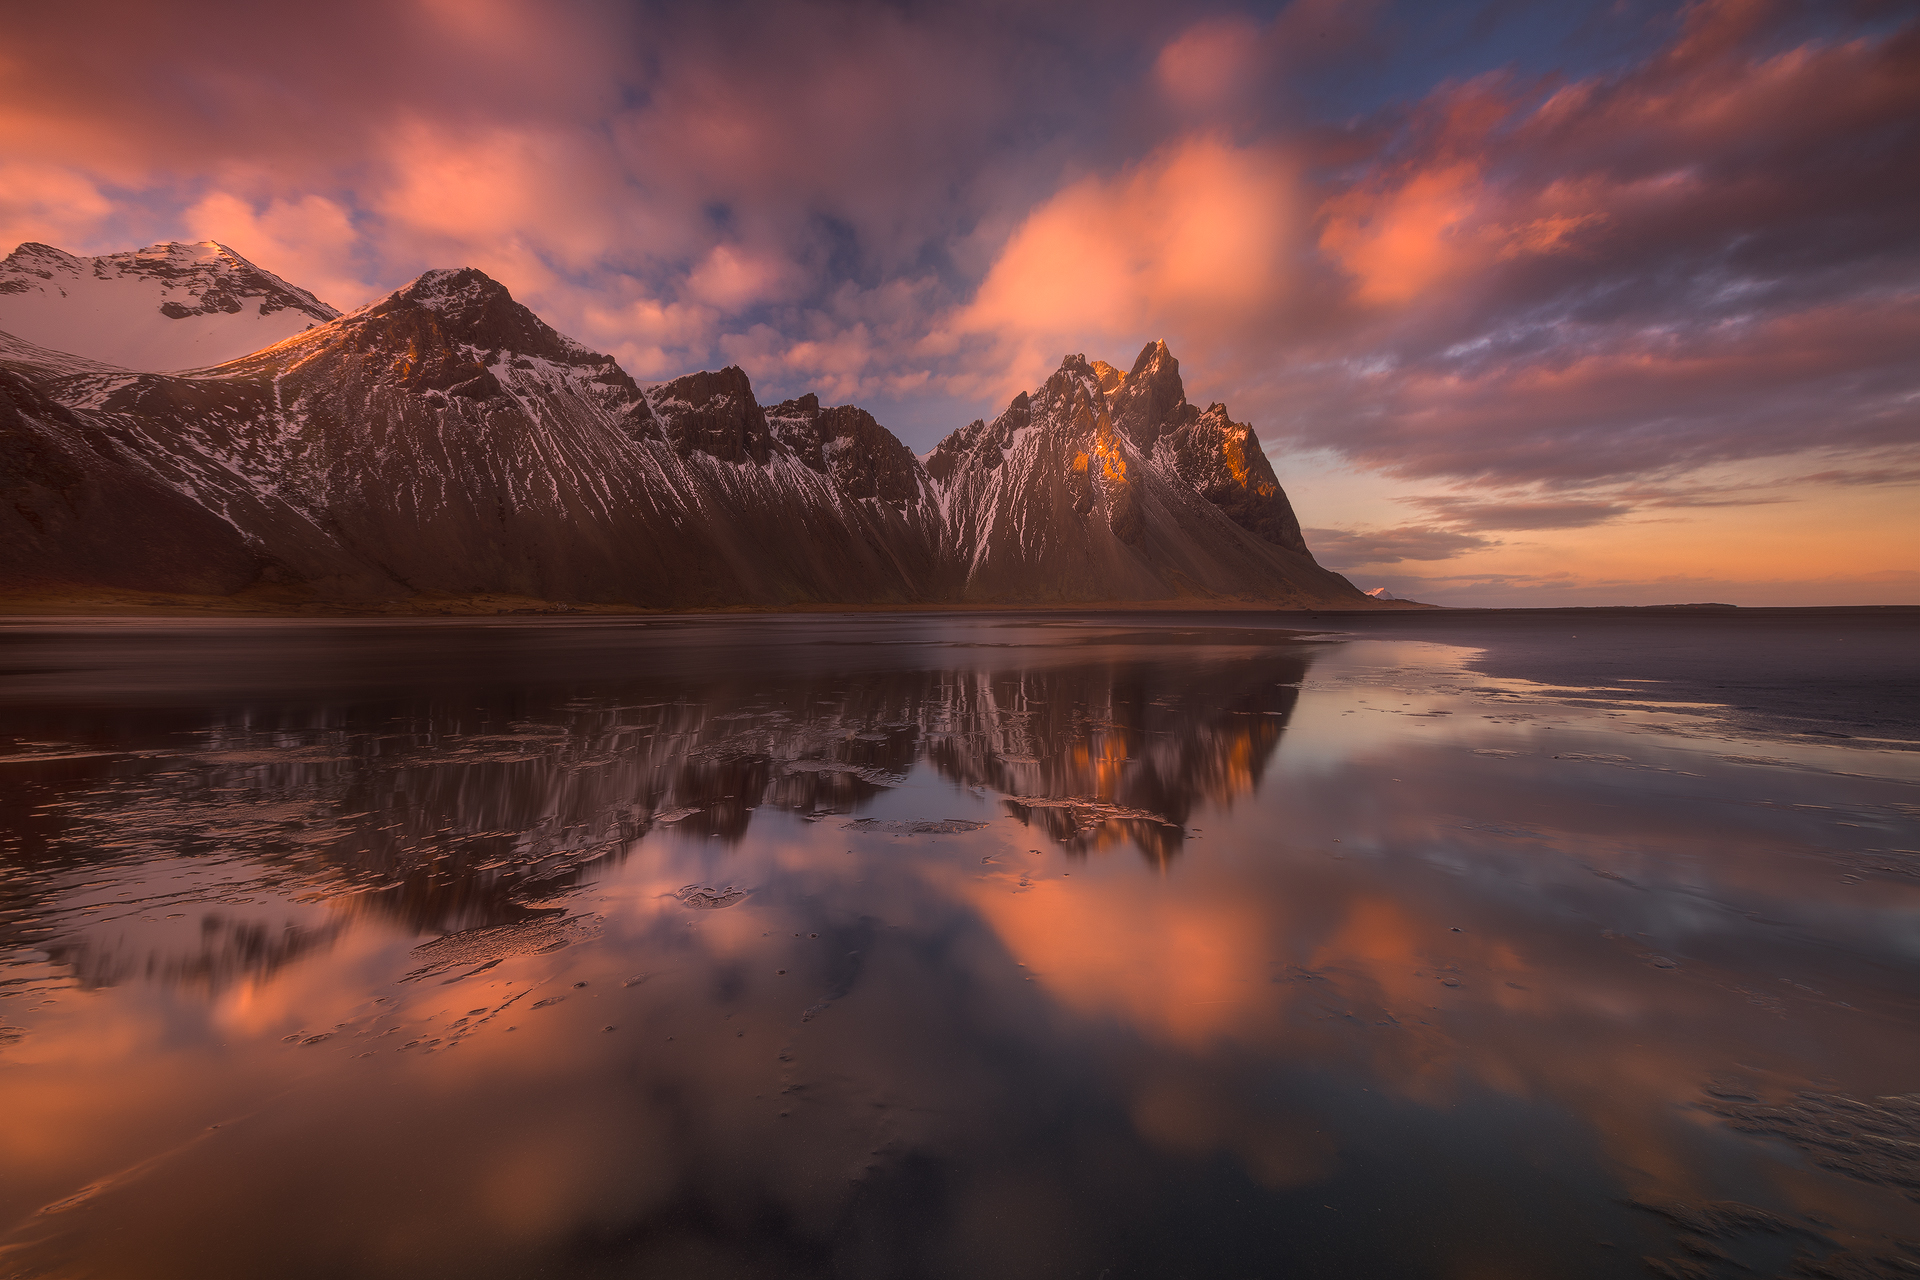 Vestrahorn山,毫无疑问是冰岛最引人注目的山脉之一。